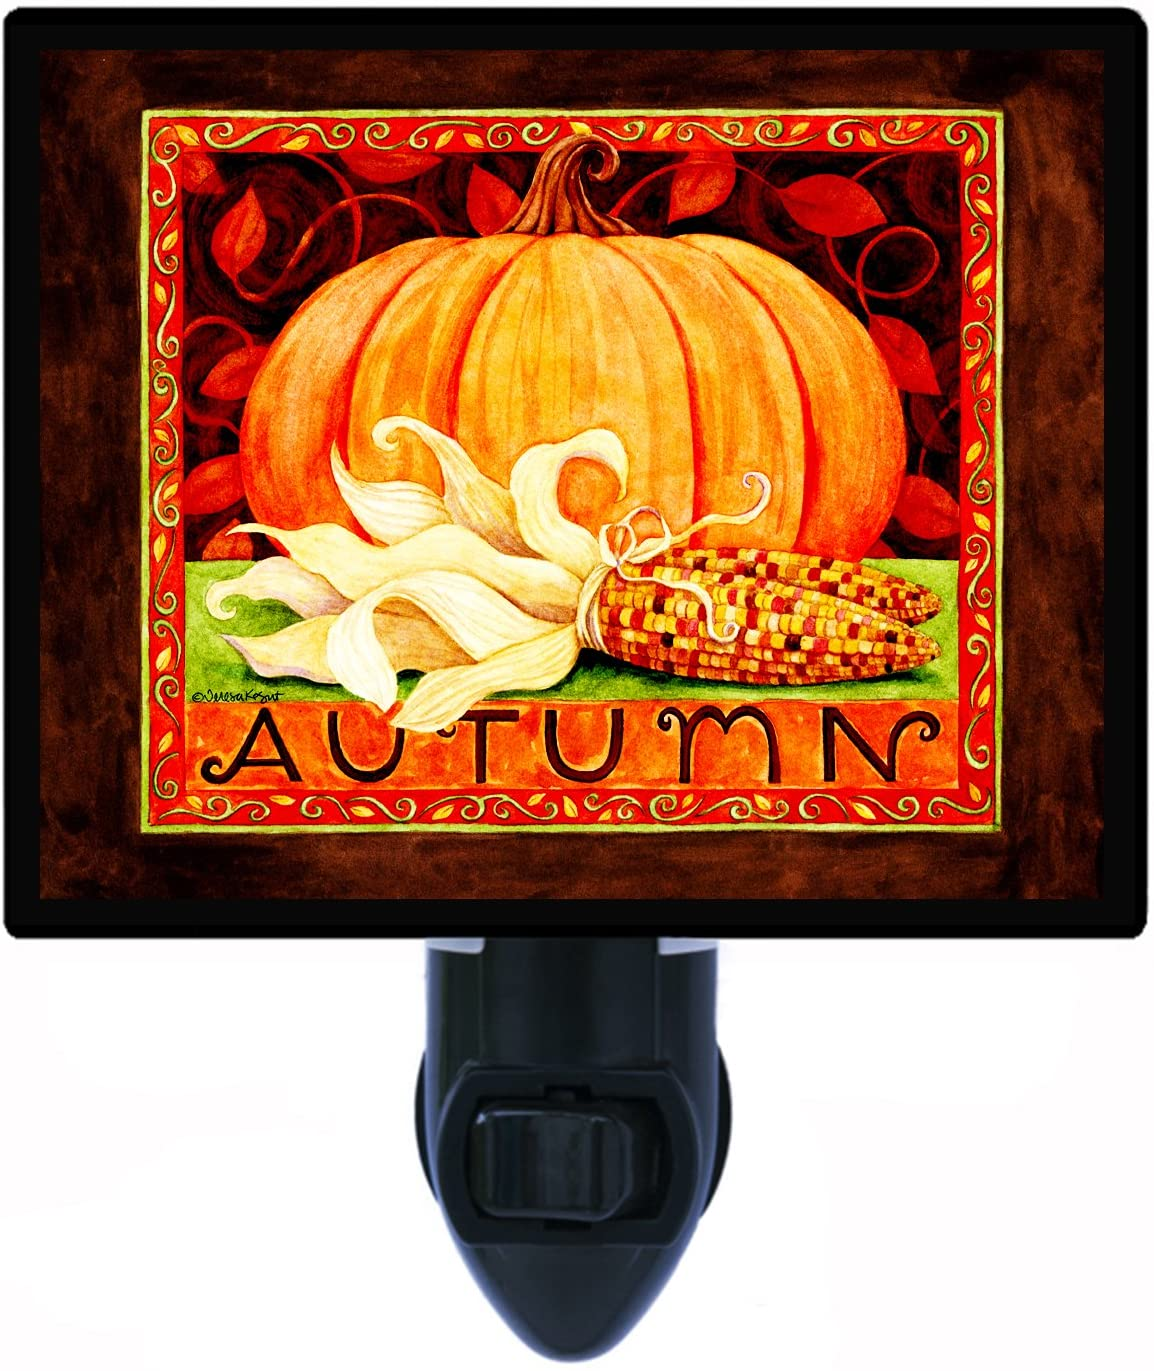 Fall and Autumn Night Light, Autumn, Pumkpin LED Night Light